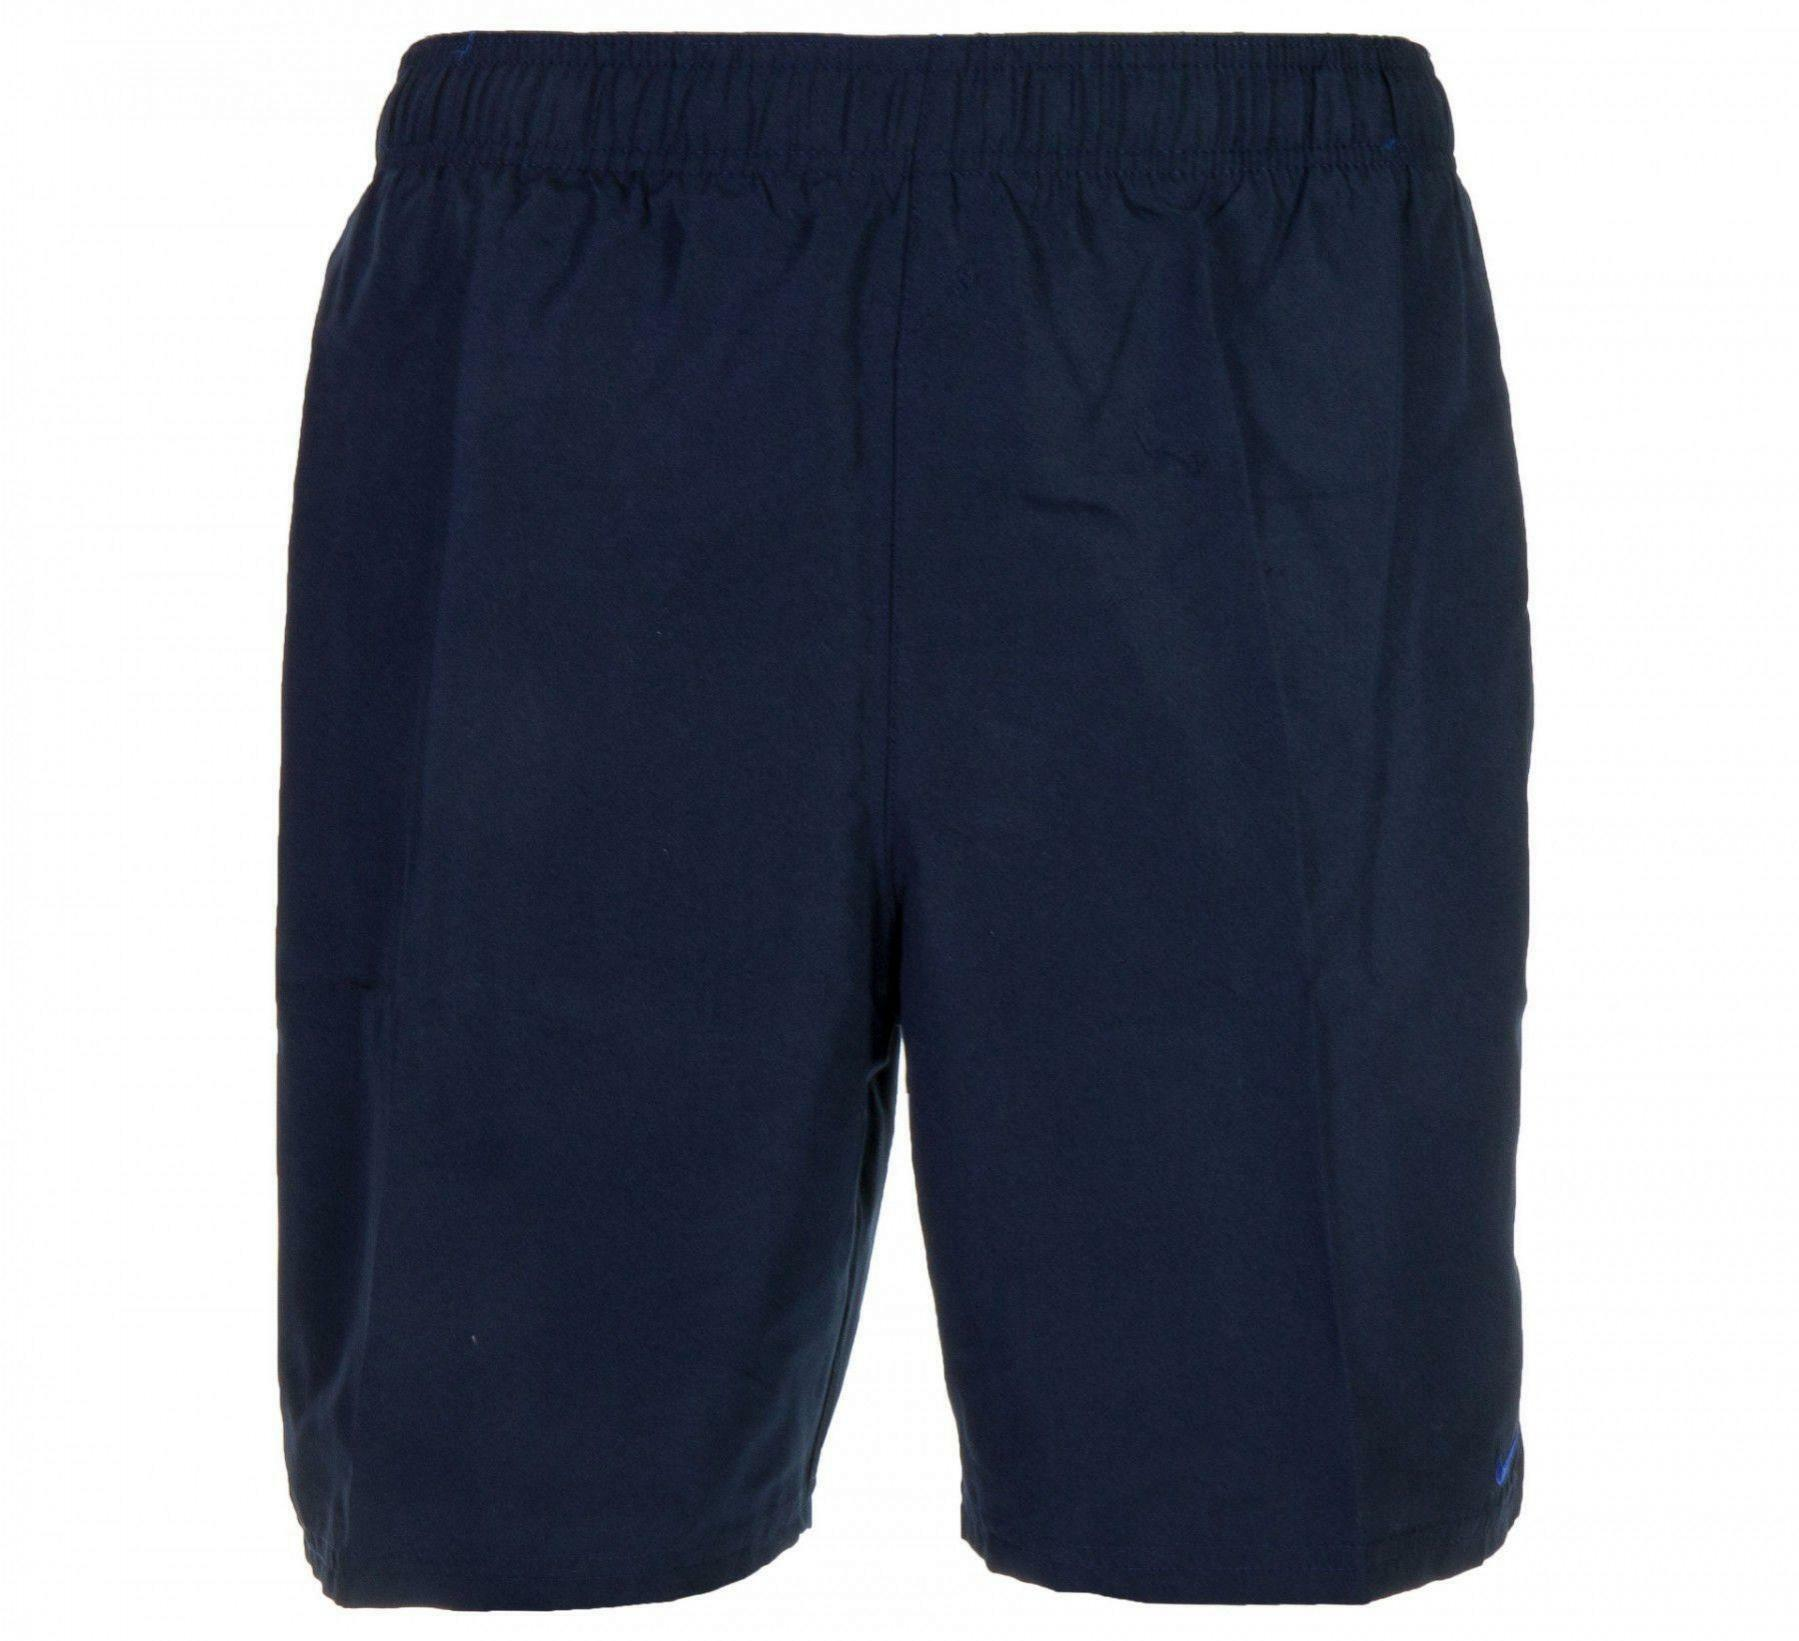 nike nike 7 volley short costume uomo blu scuro ness8510-489